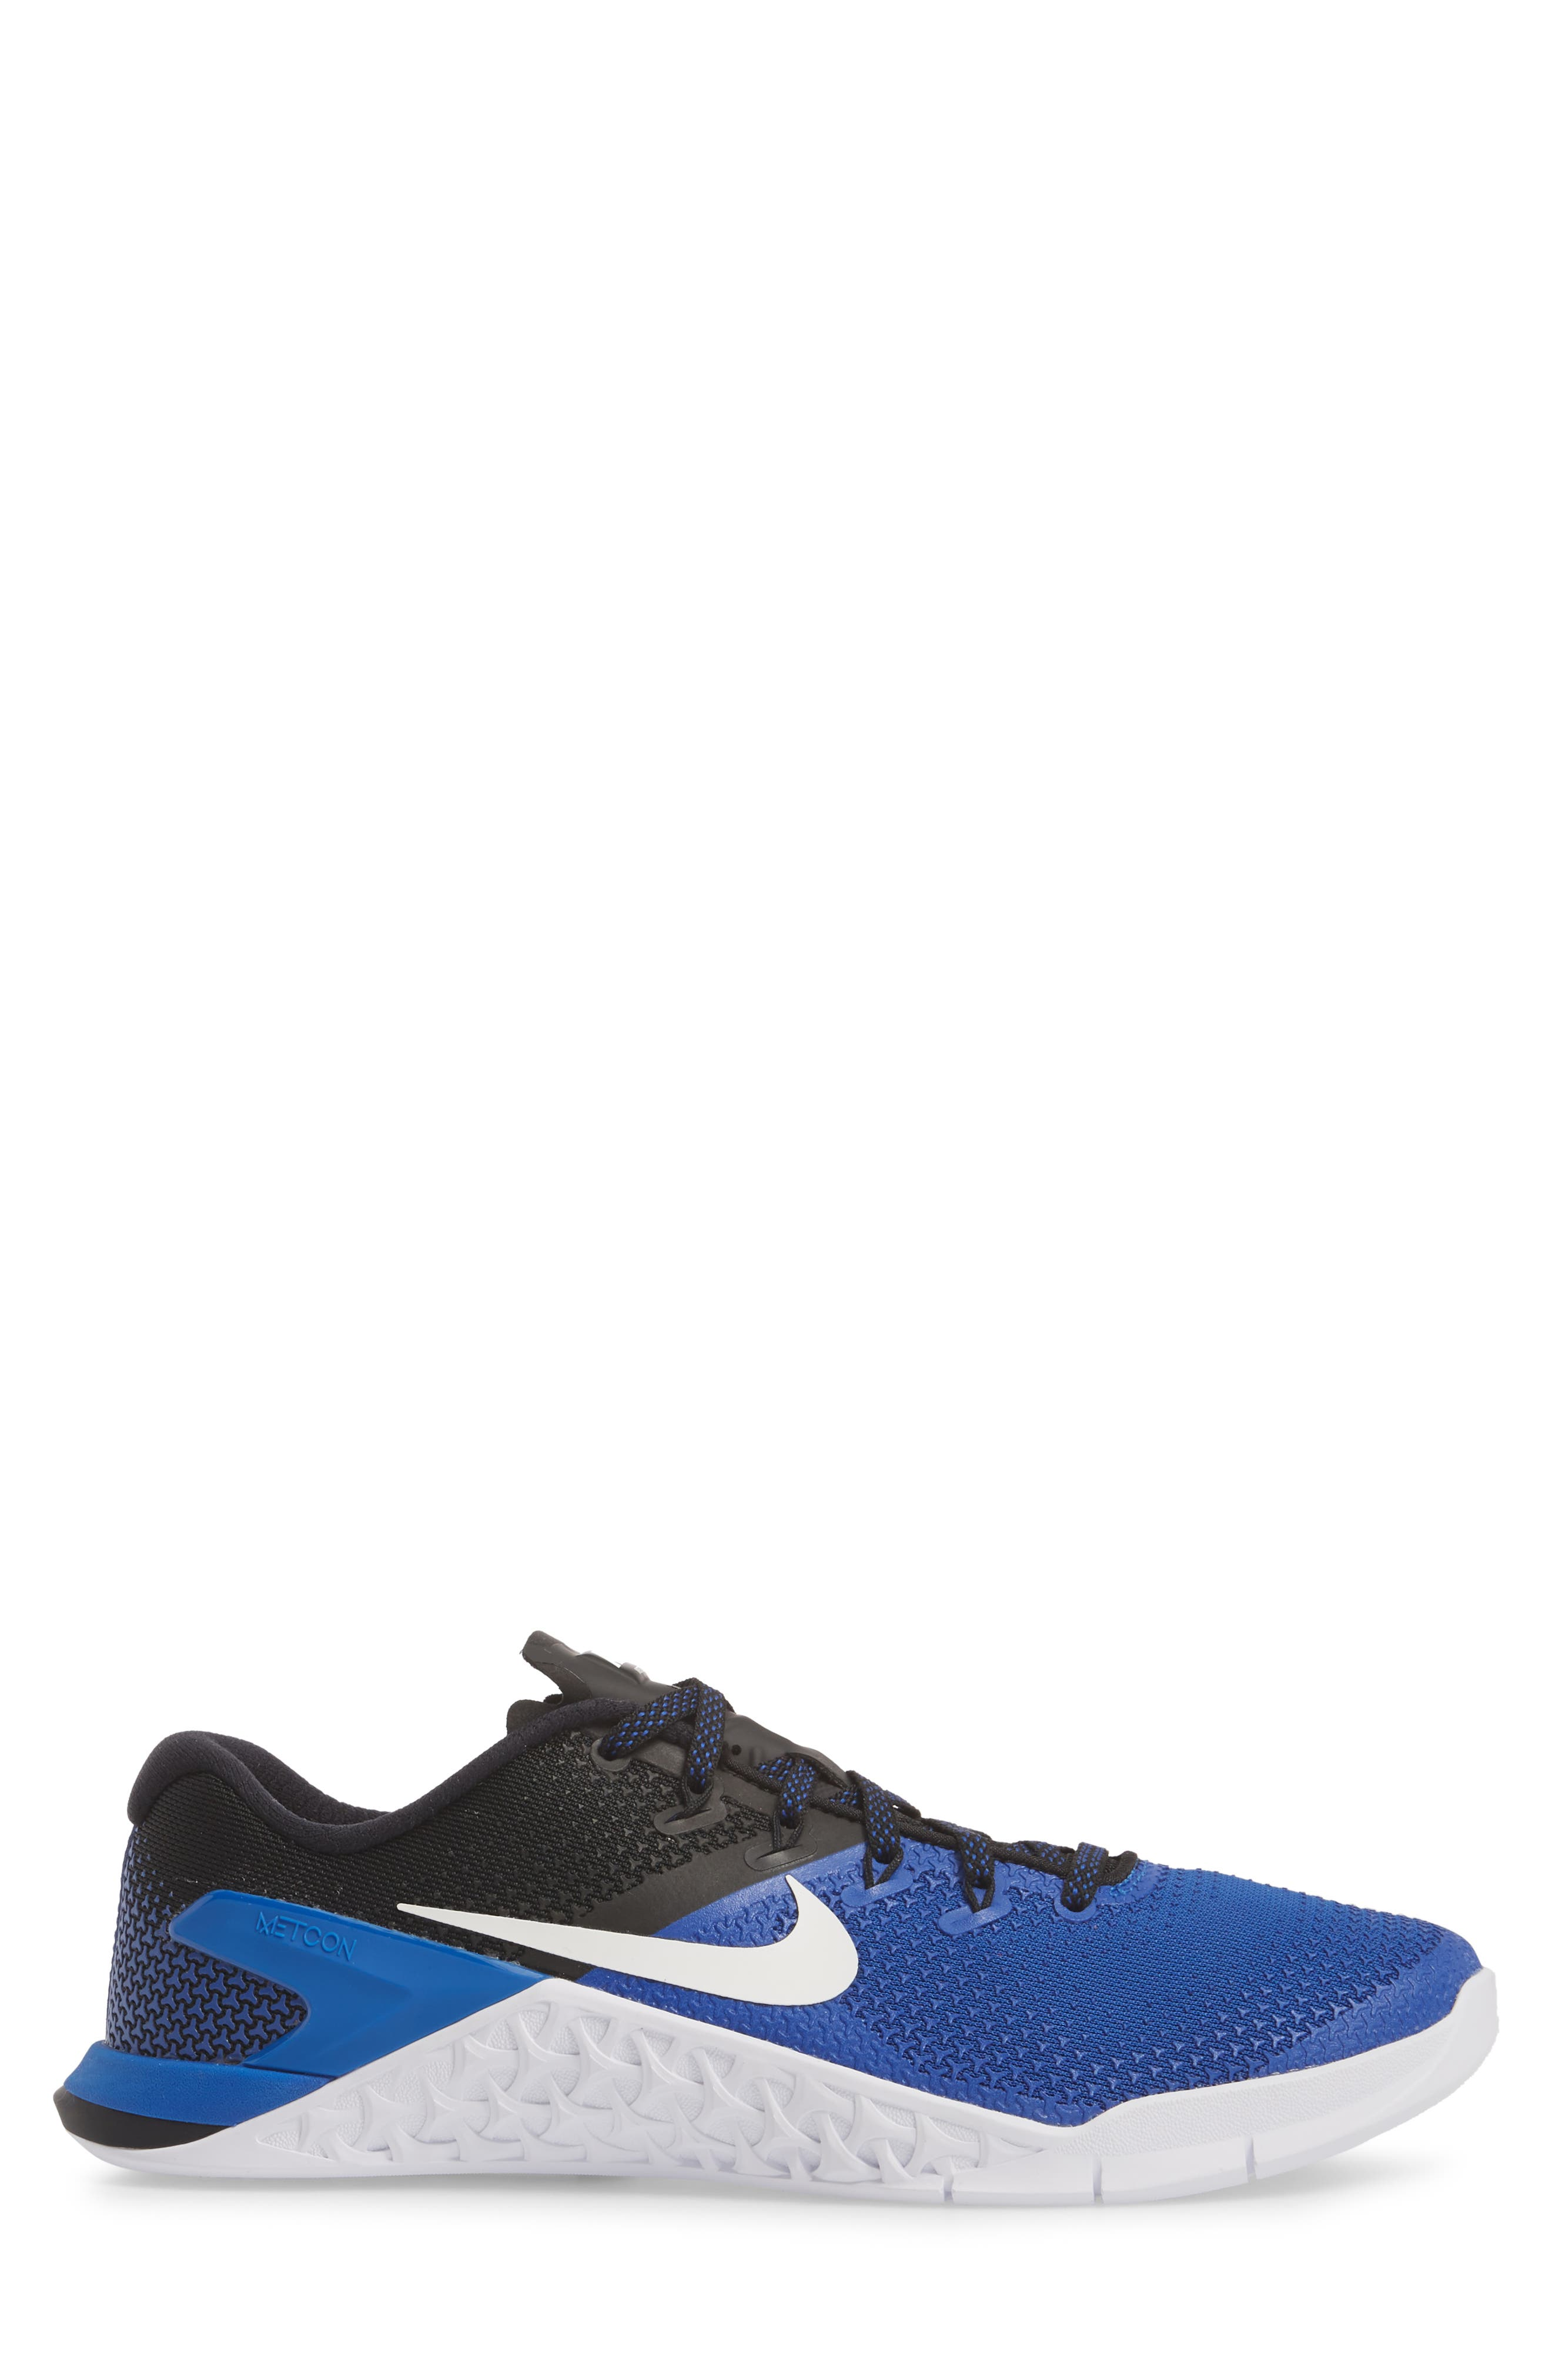 Metcon 4 Training Shoe,                             Alternate thumbnail 3, color,                             GAME ROYAL/ WHITE/ BLACK